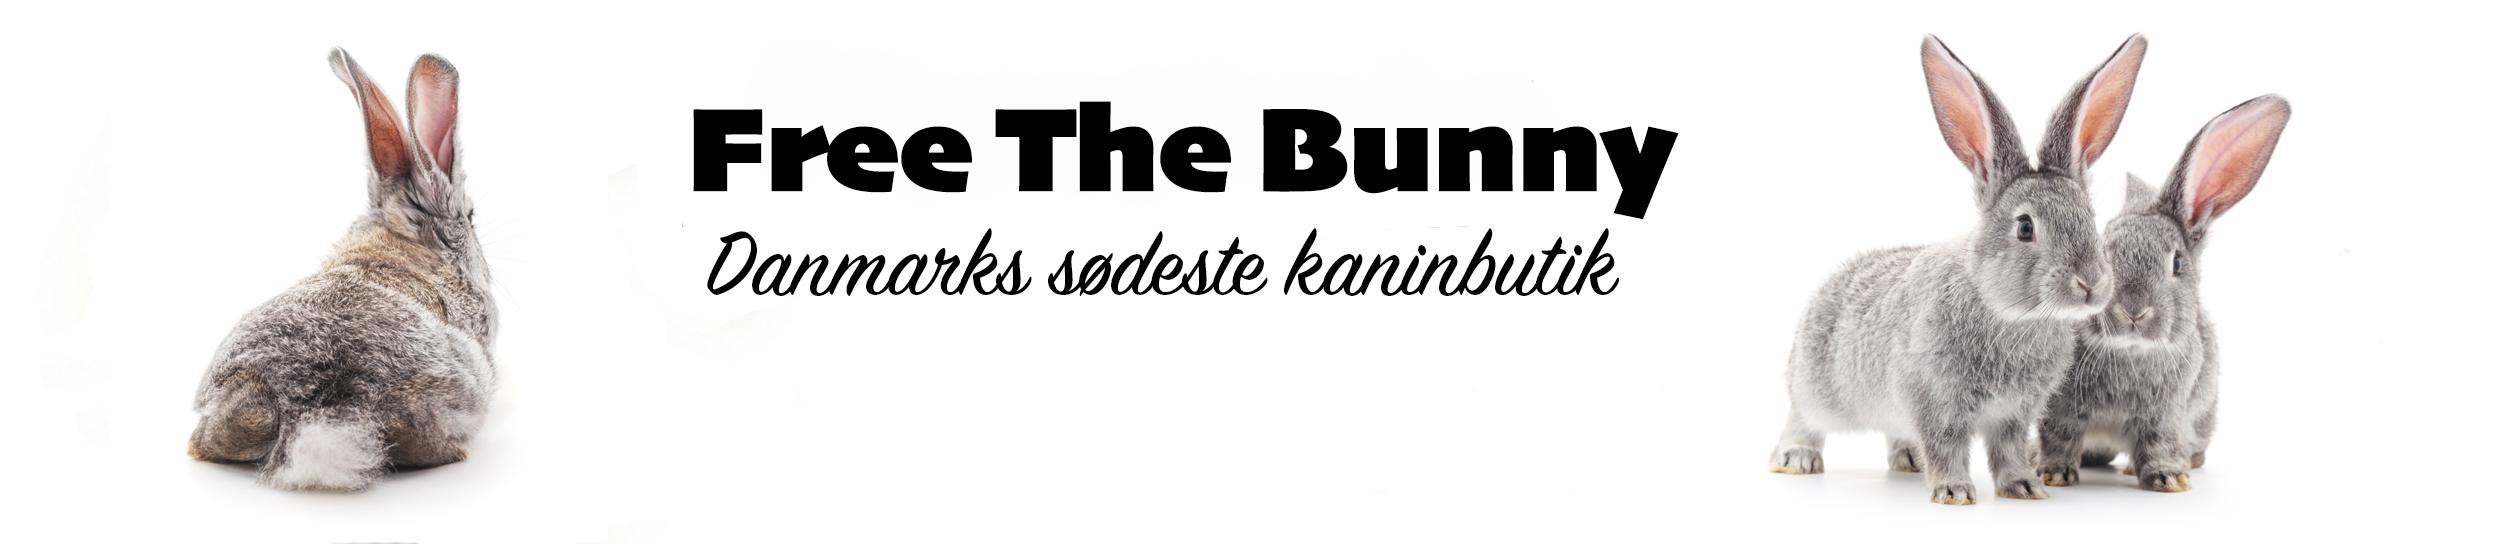 free the bunny danmarks sødeste kaninbutik